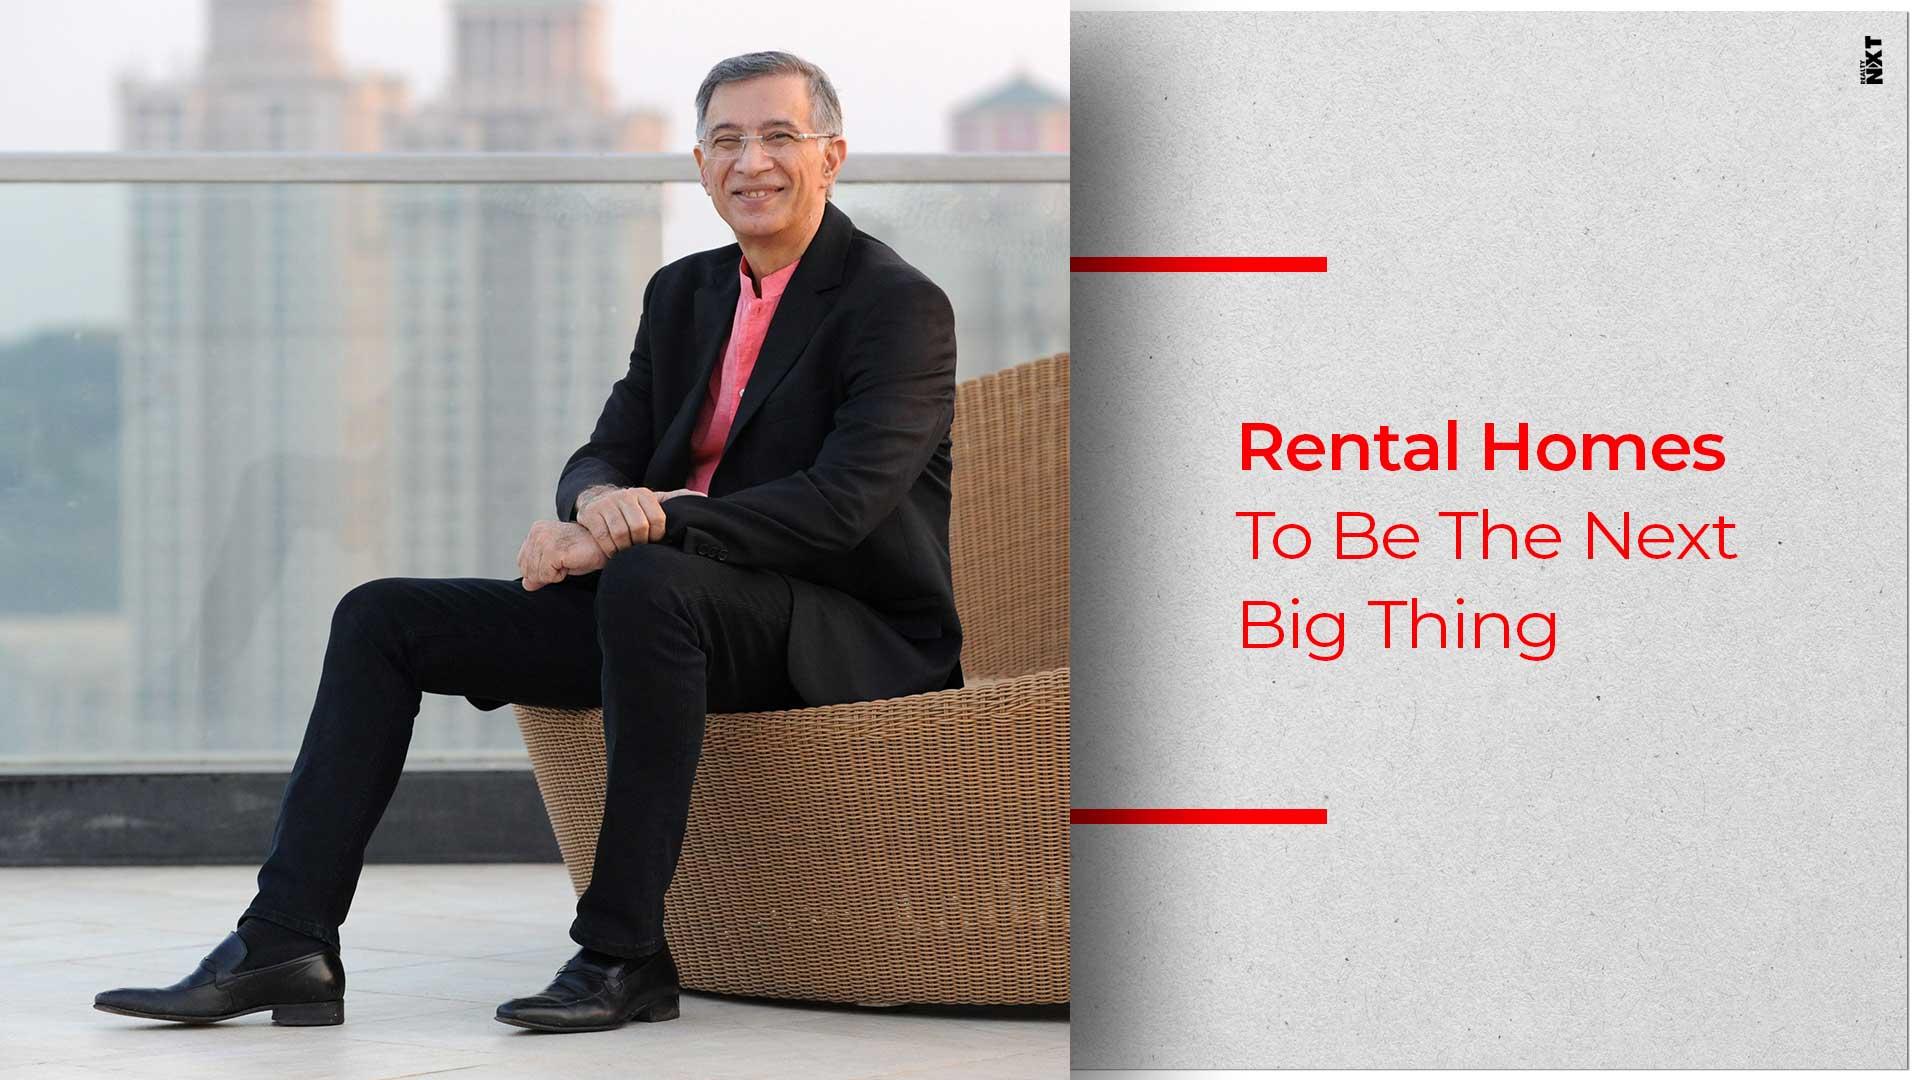 Niranjan Hiranandani Predicts A Soar In Home Rental Popularity